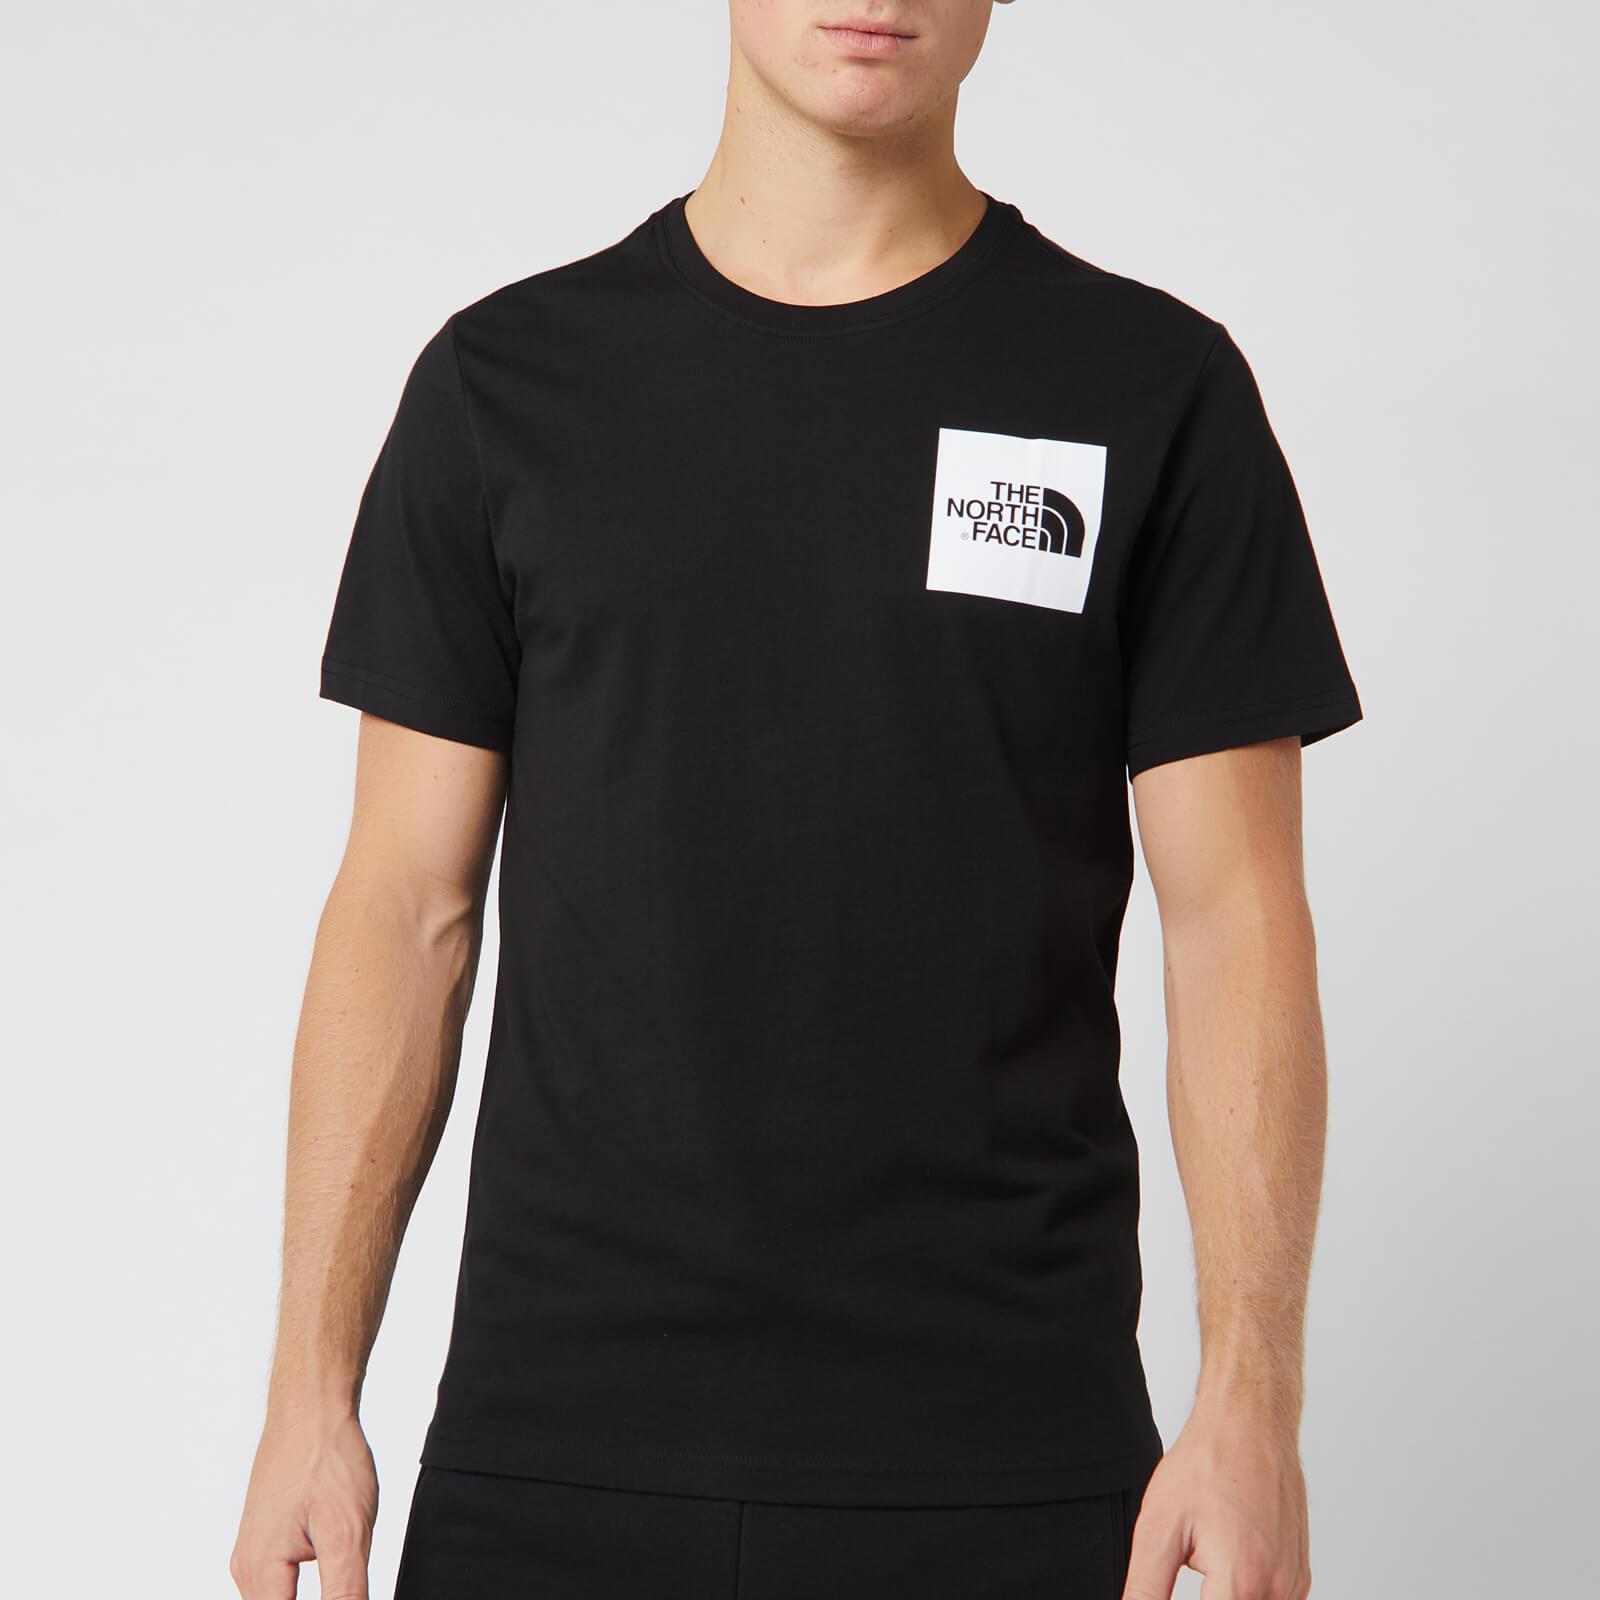 The North Face Men's Short Sleeve Fine T-Shirt - TNF Black